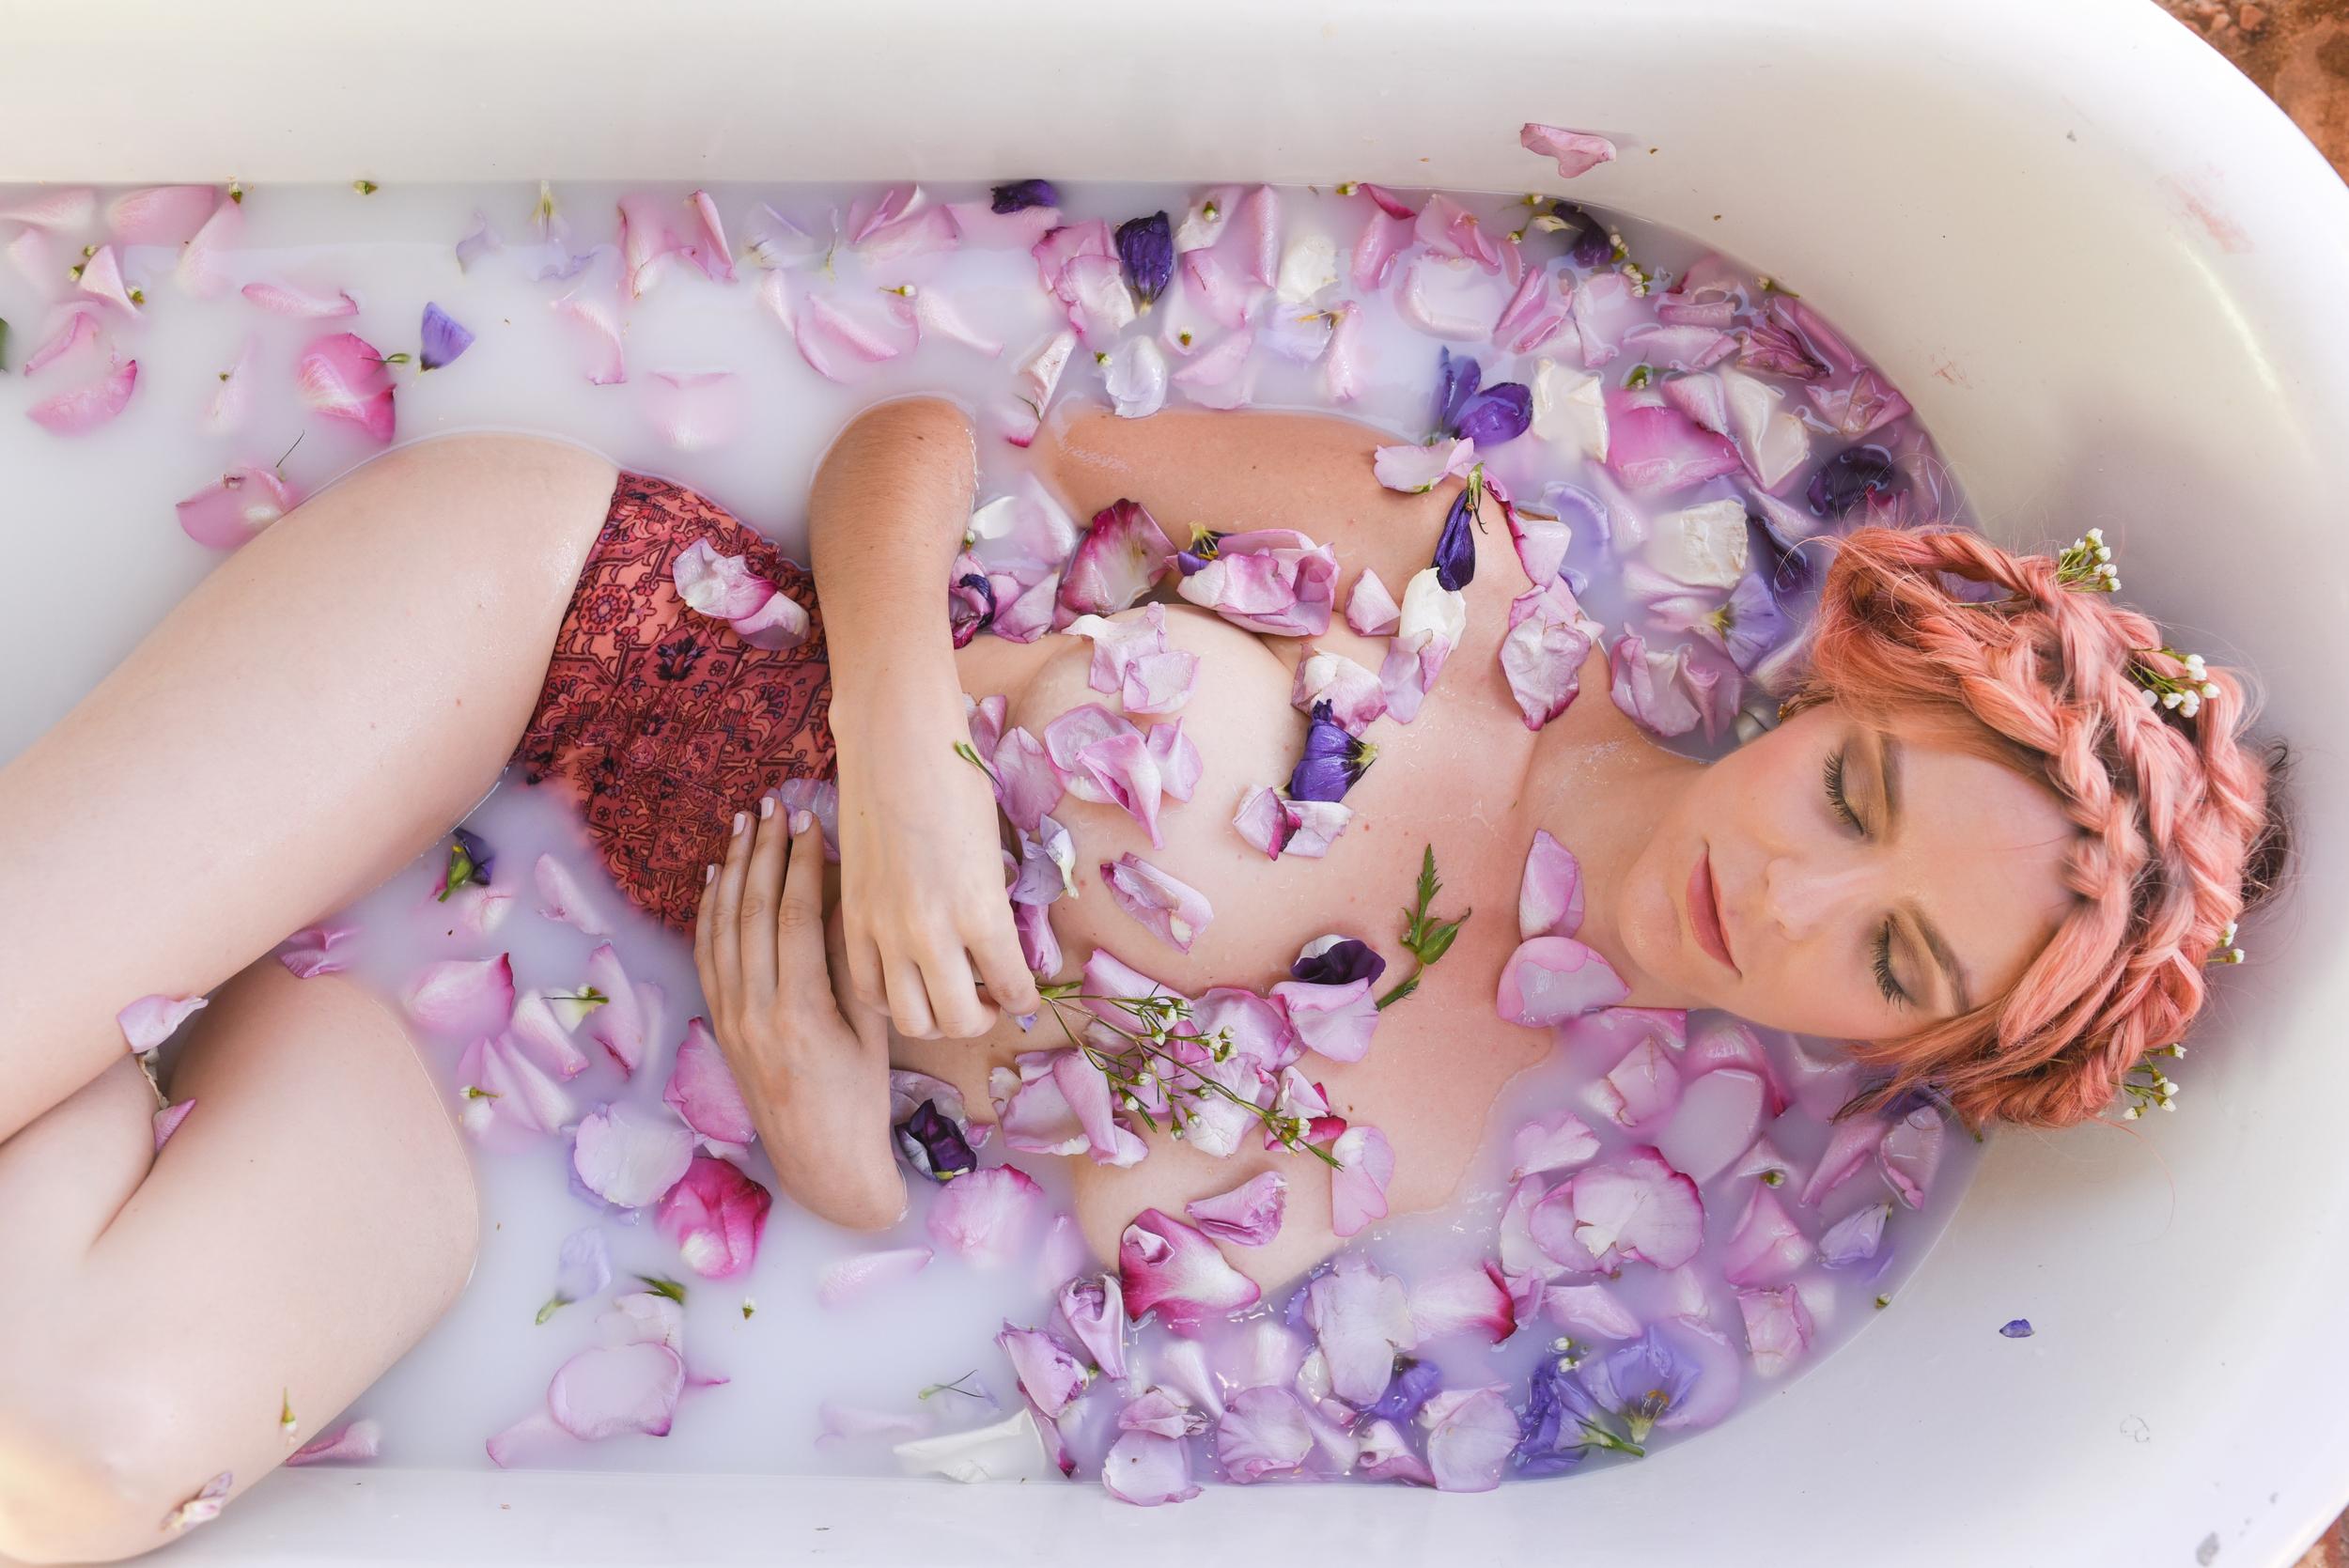 rose bath, milk bath, flores lane candles, boho bunnie, joshua tree, rose petal bath, milky bath shoot, pink hair, pastel pink hair, overtone pink hair